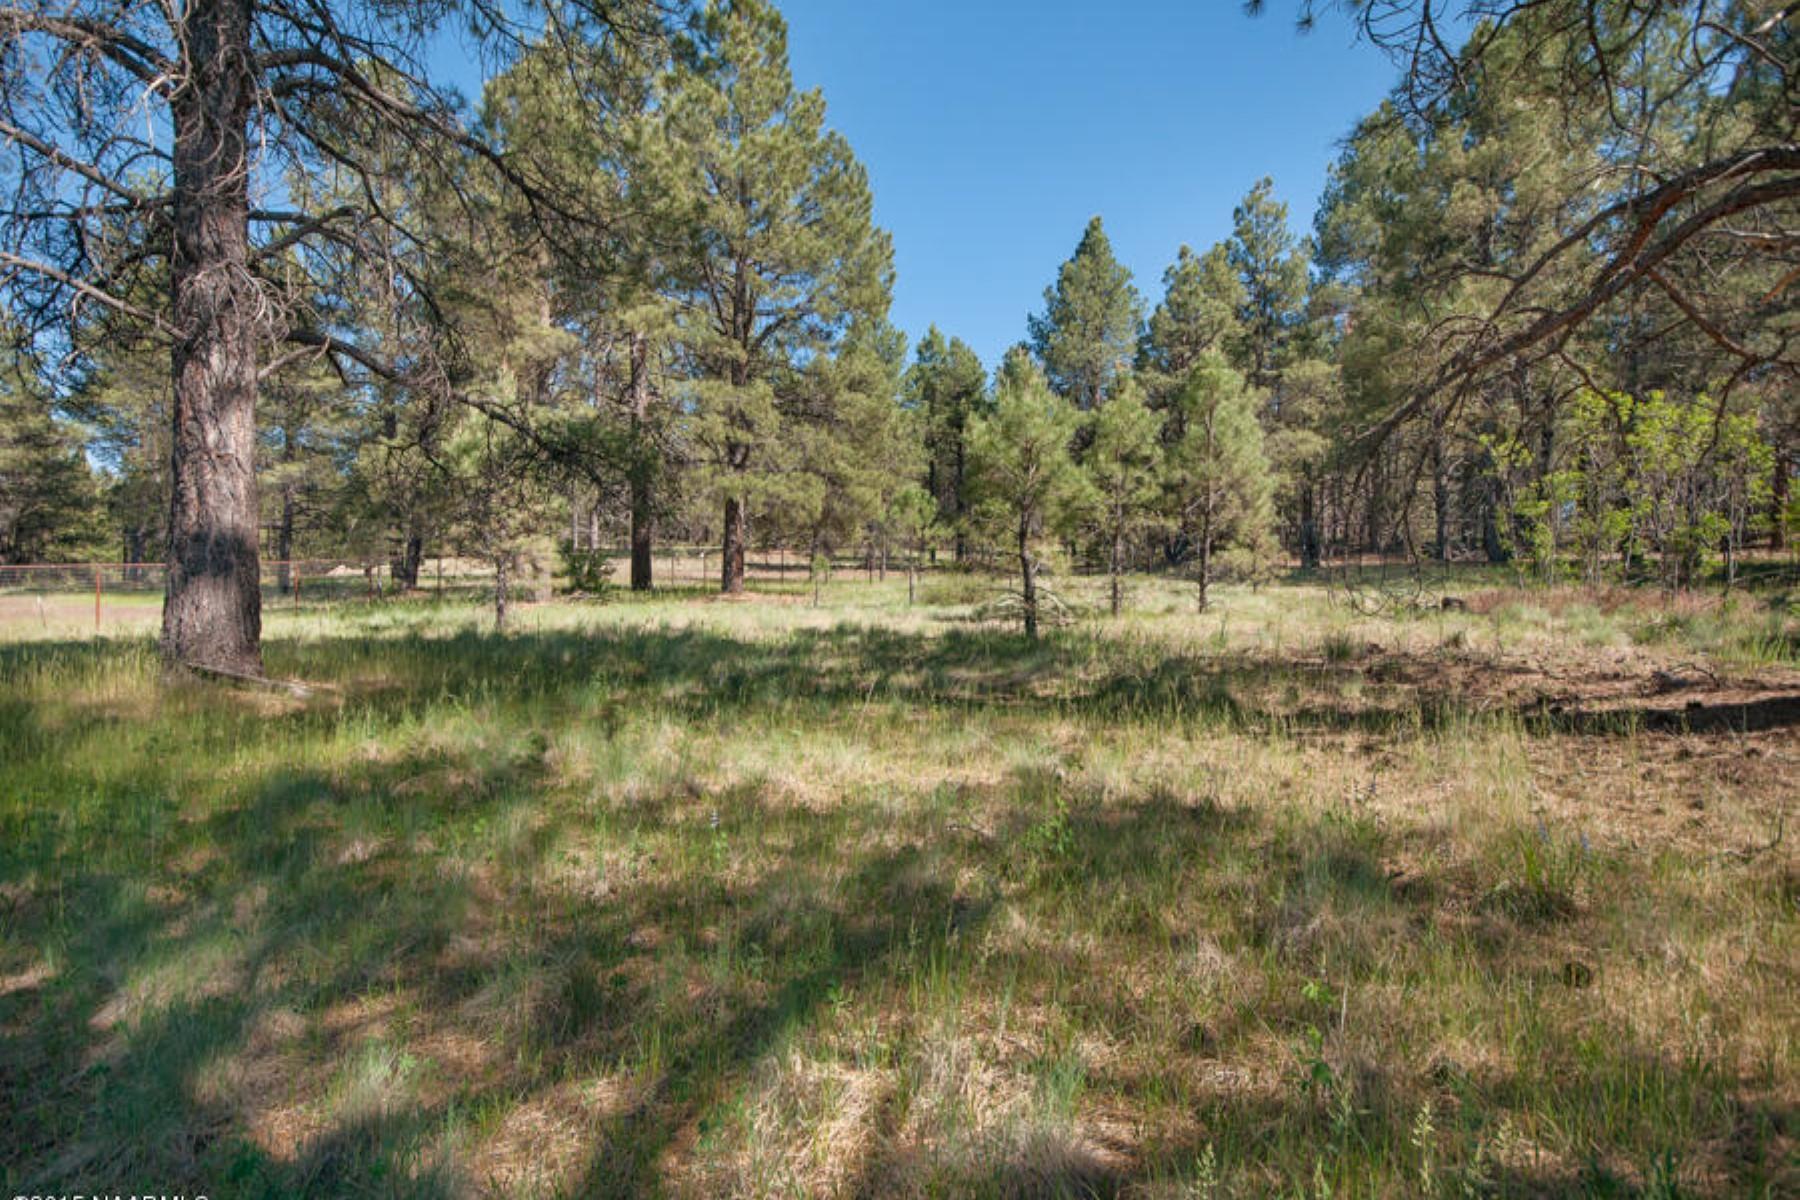 Maison unifamiliale pour l Vente à Well maintained log sided home on 2.89 Peaceful acres. 1458 Homestead RD Flagstaff, Arizona 86005 États-Unis